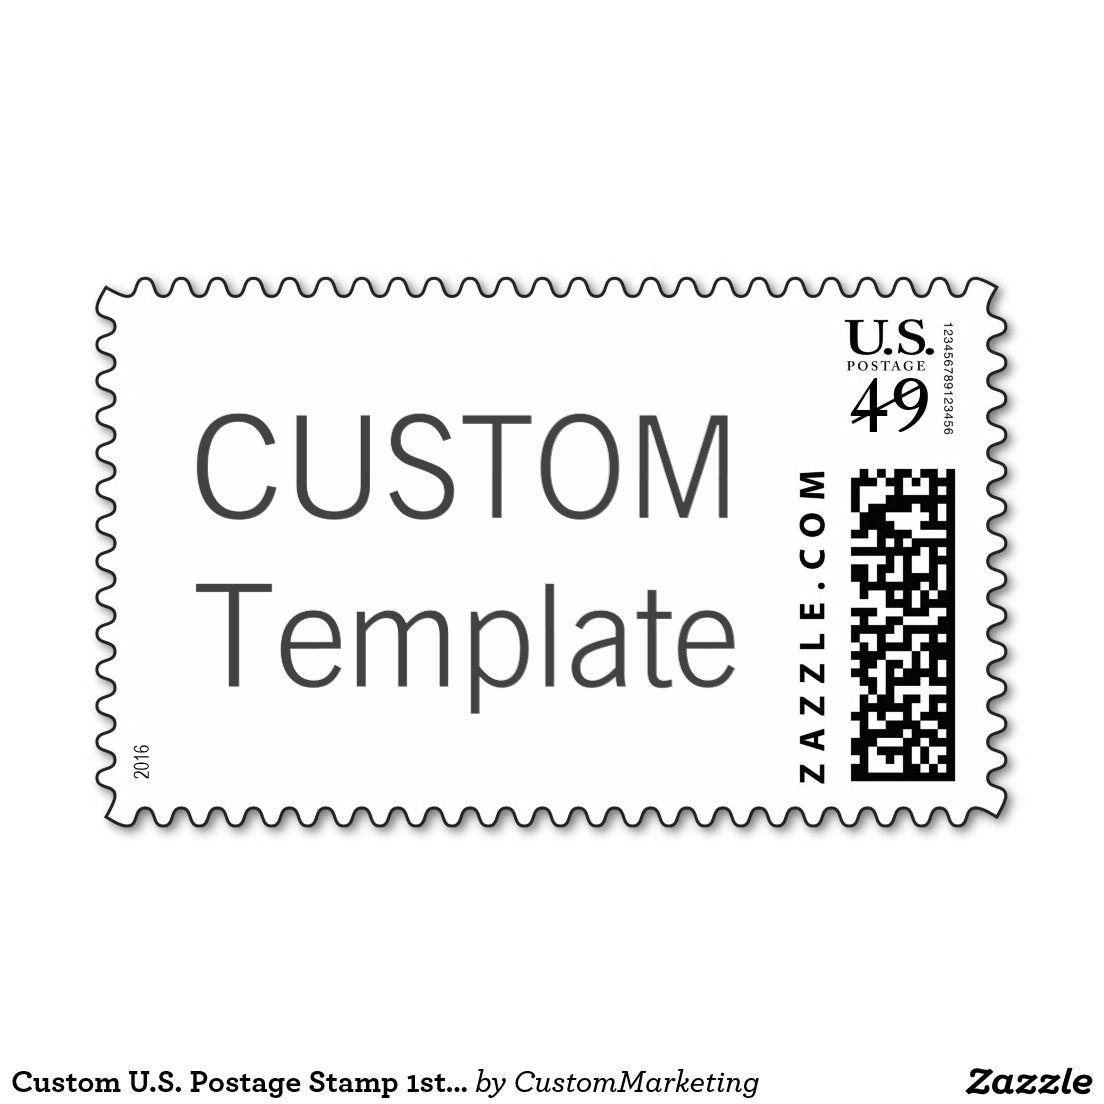 Custom U.S. Postage Stamp 1st Class Letter to 1oz